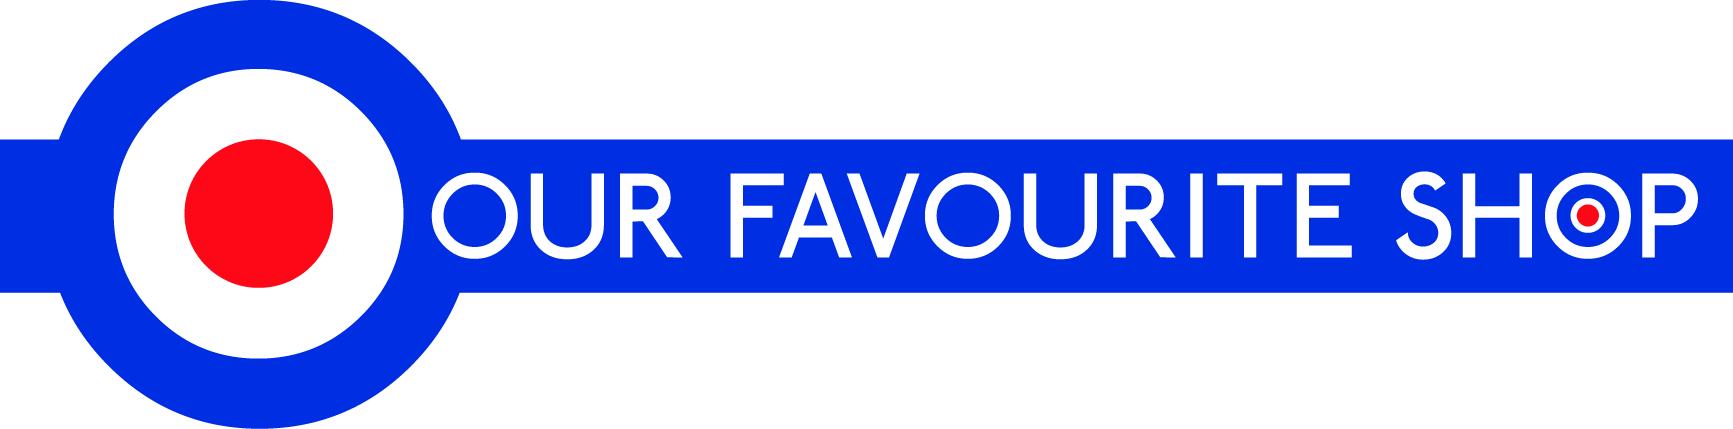 logo Our Favourite Shop